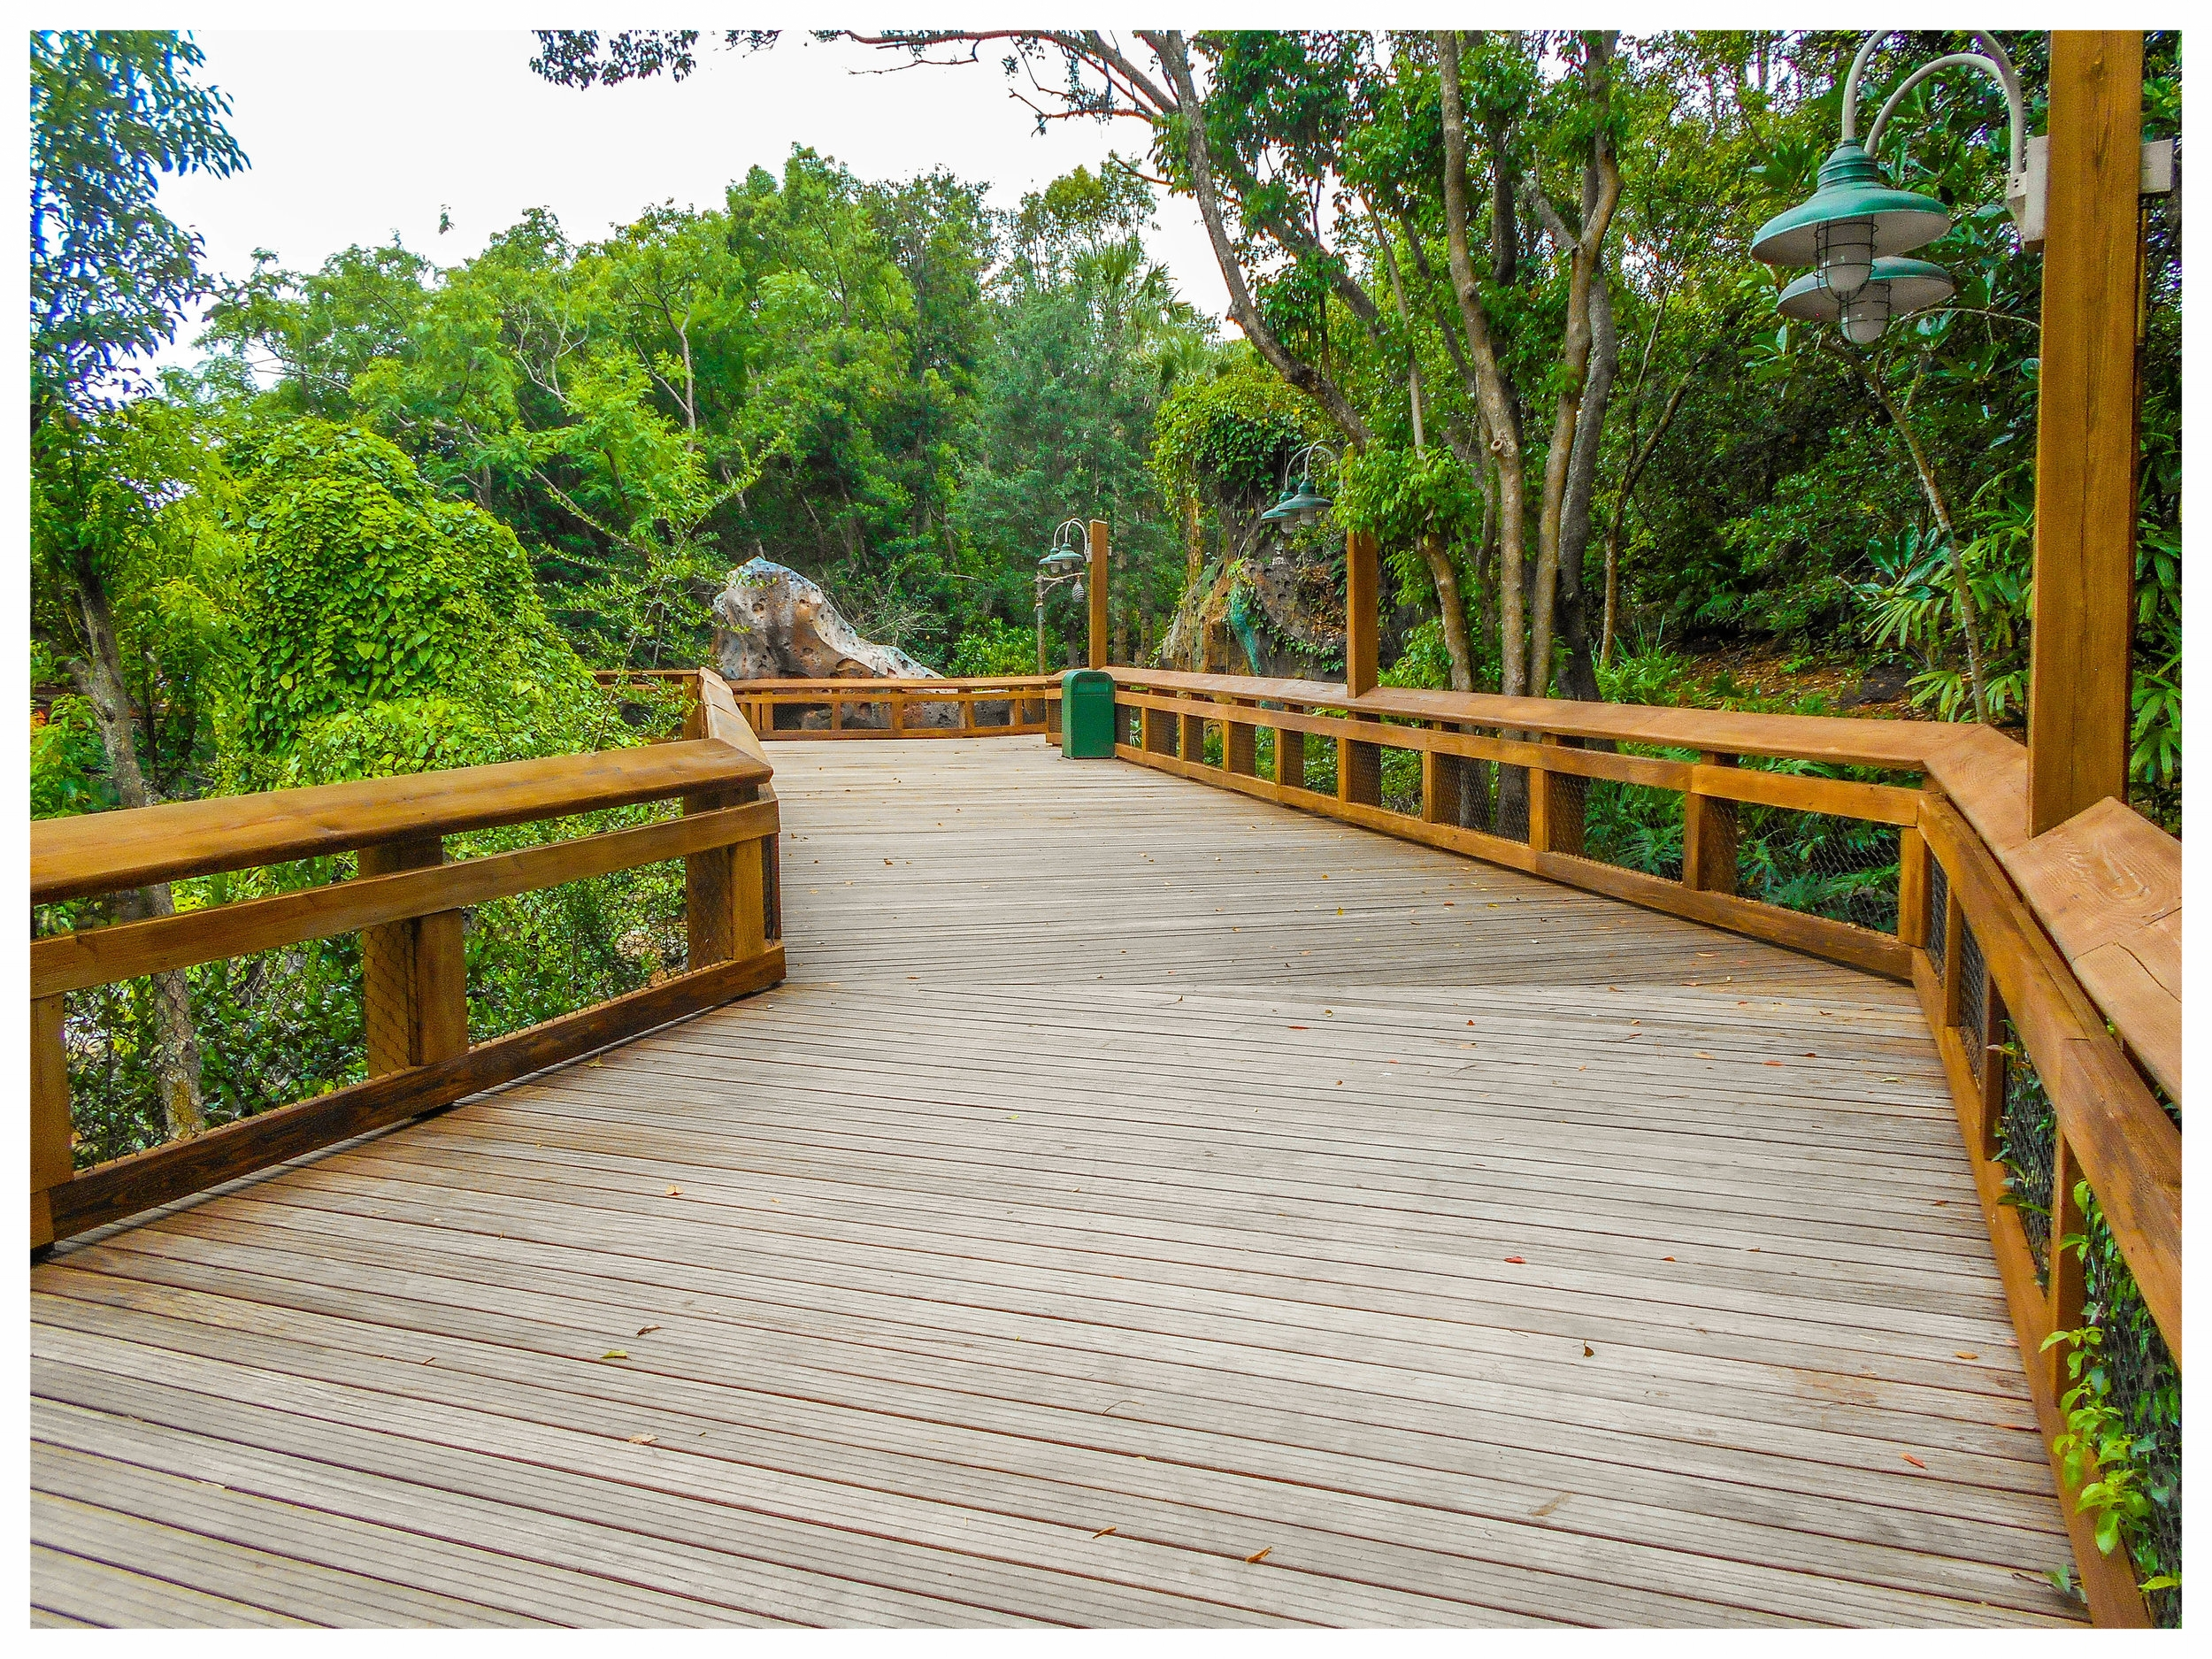 Bridge Design and Construction